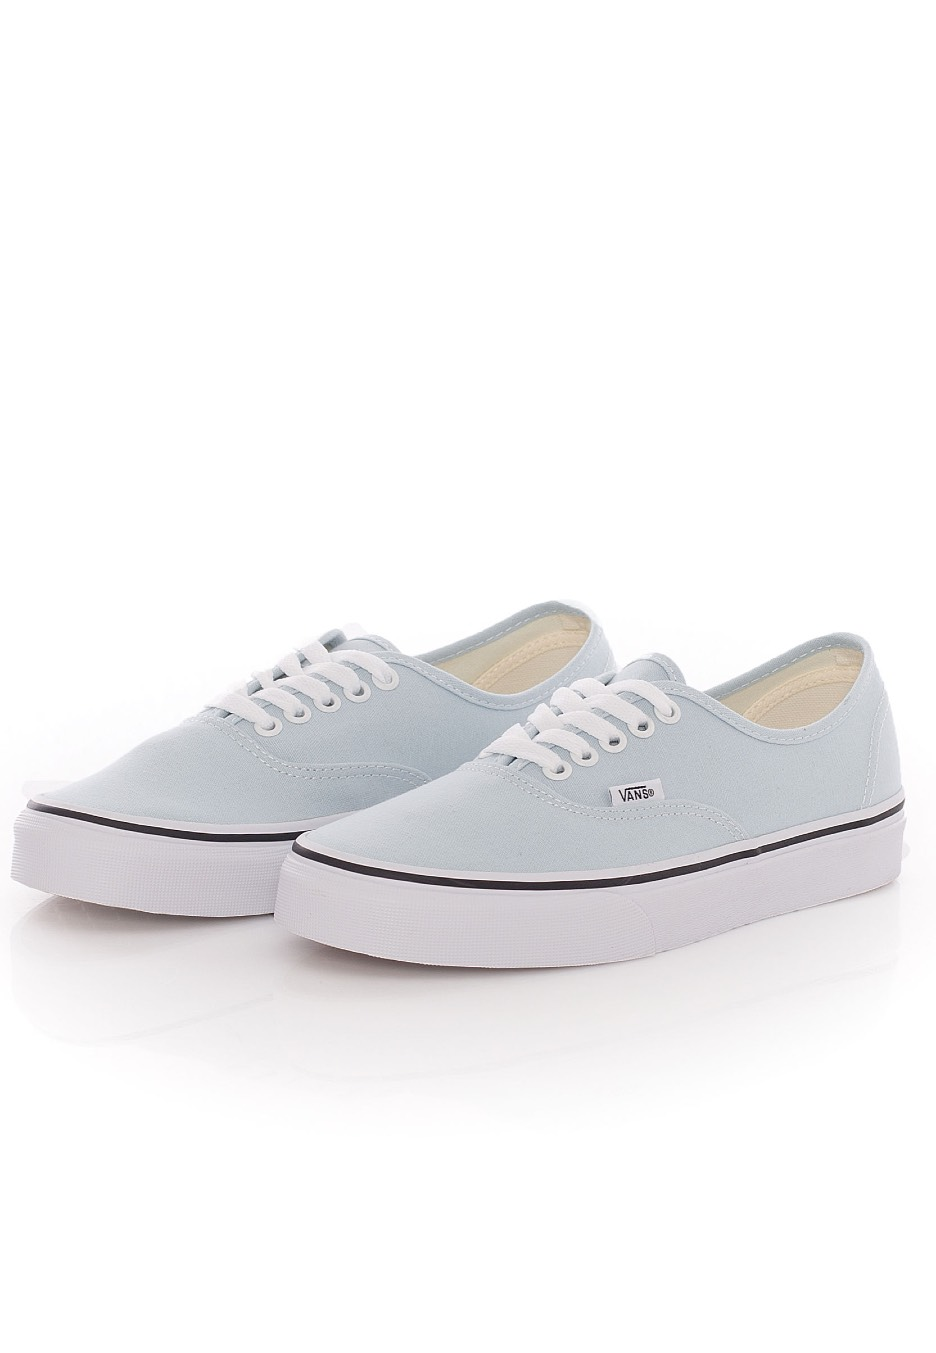 Vans - Authentic Baby Blue/True White